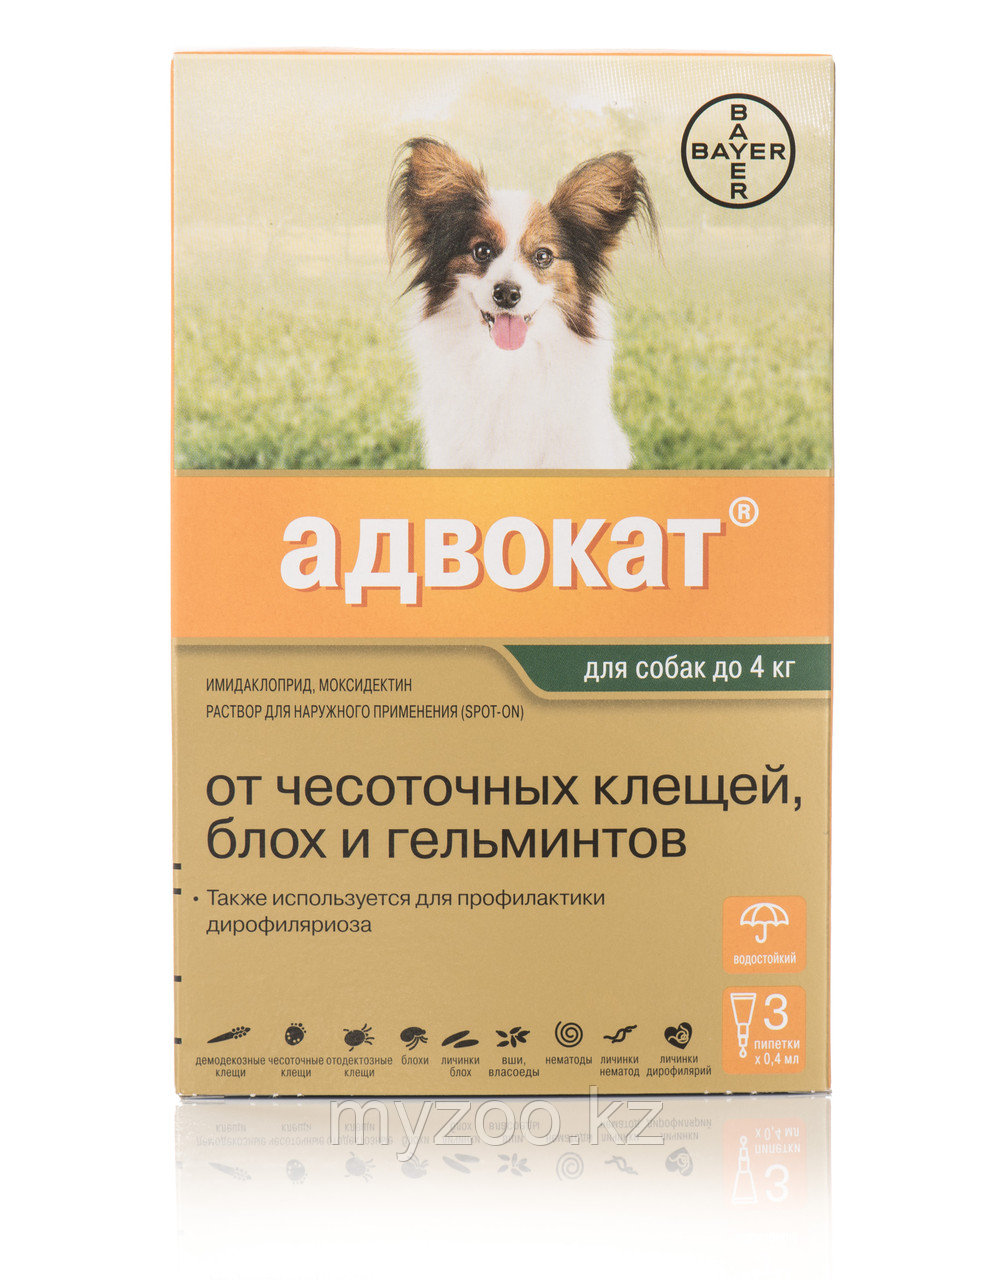 Адвокат д/собак до 4 кг, 1 пипетка